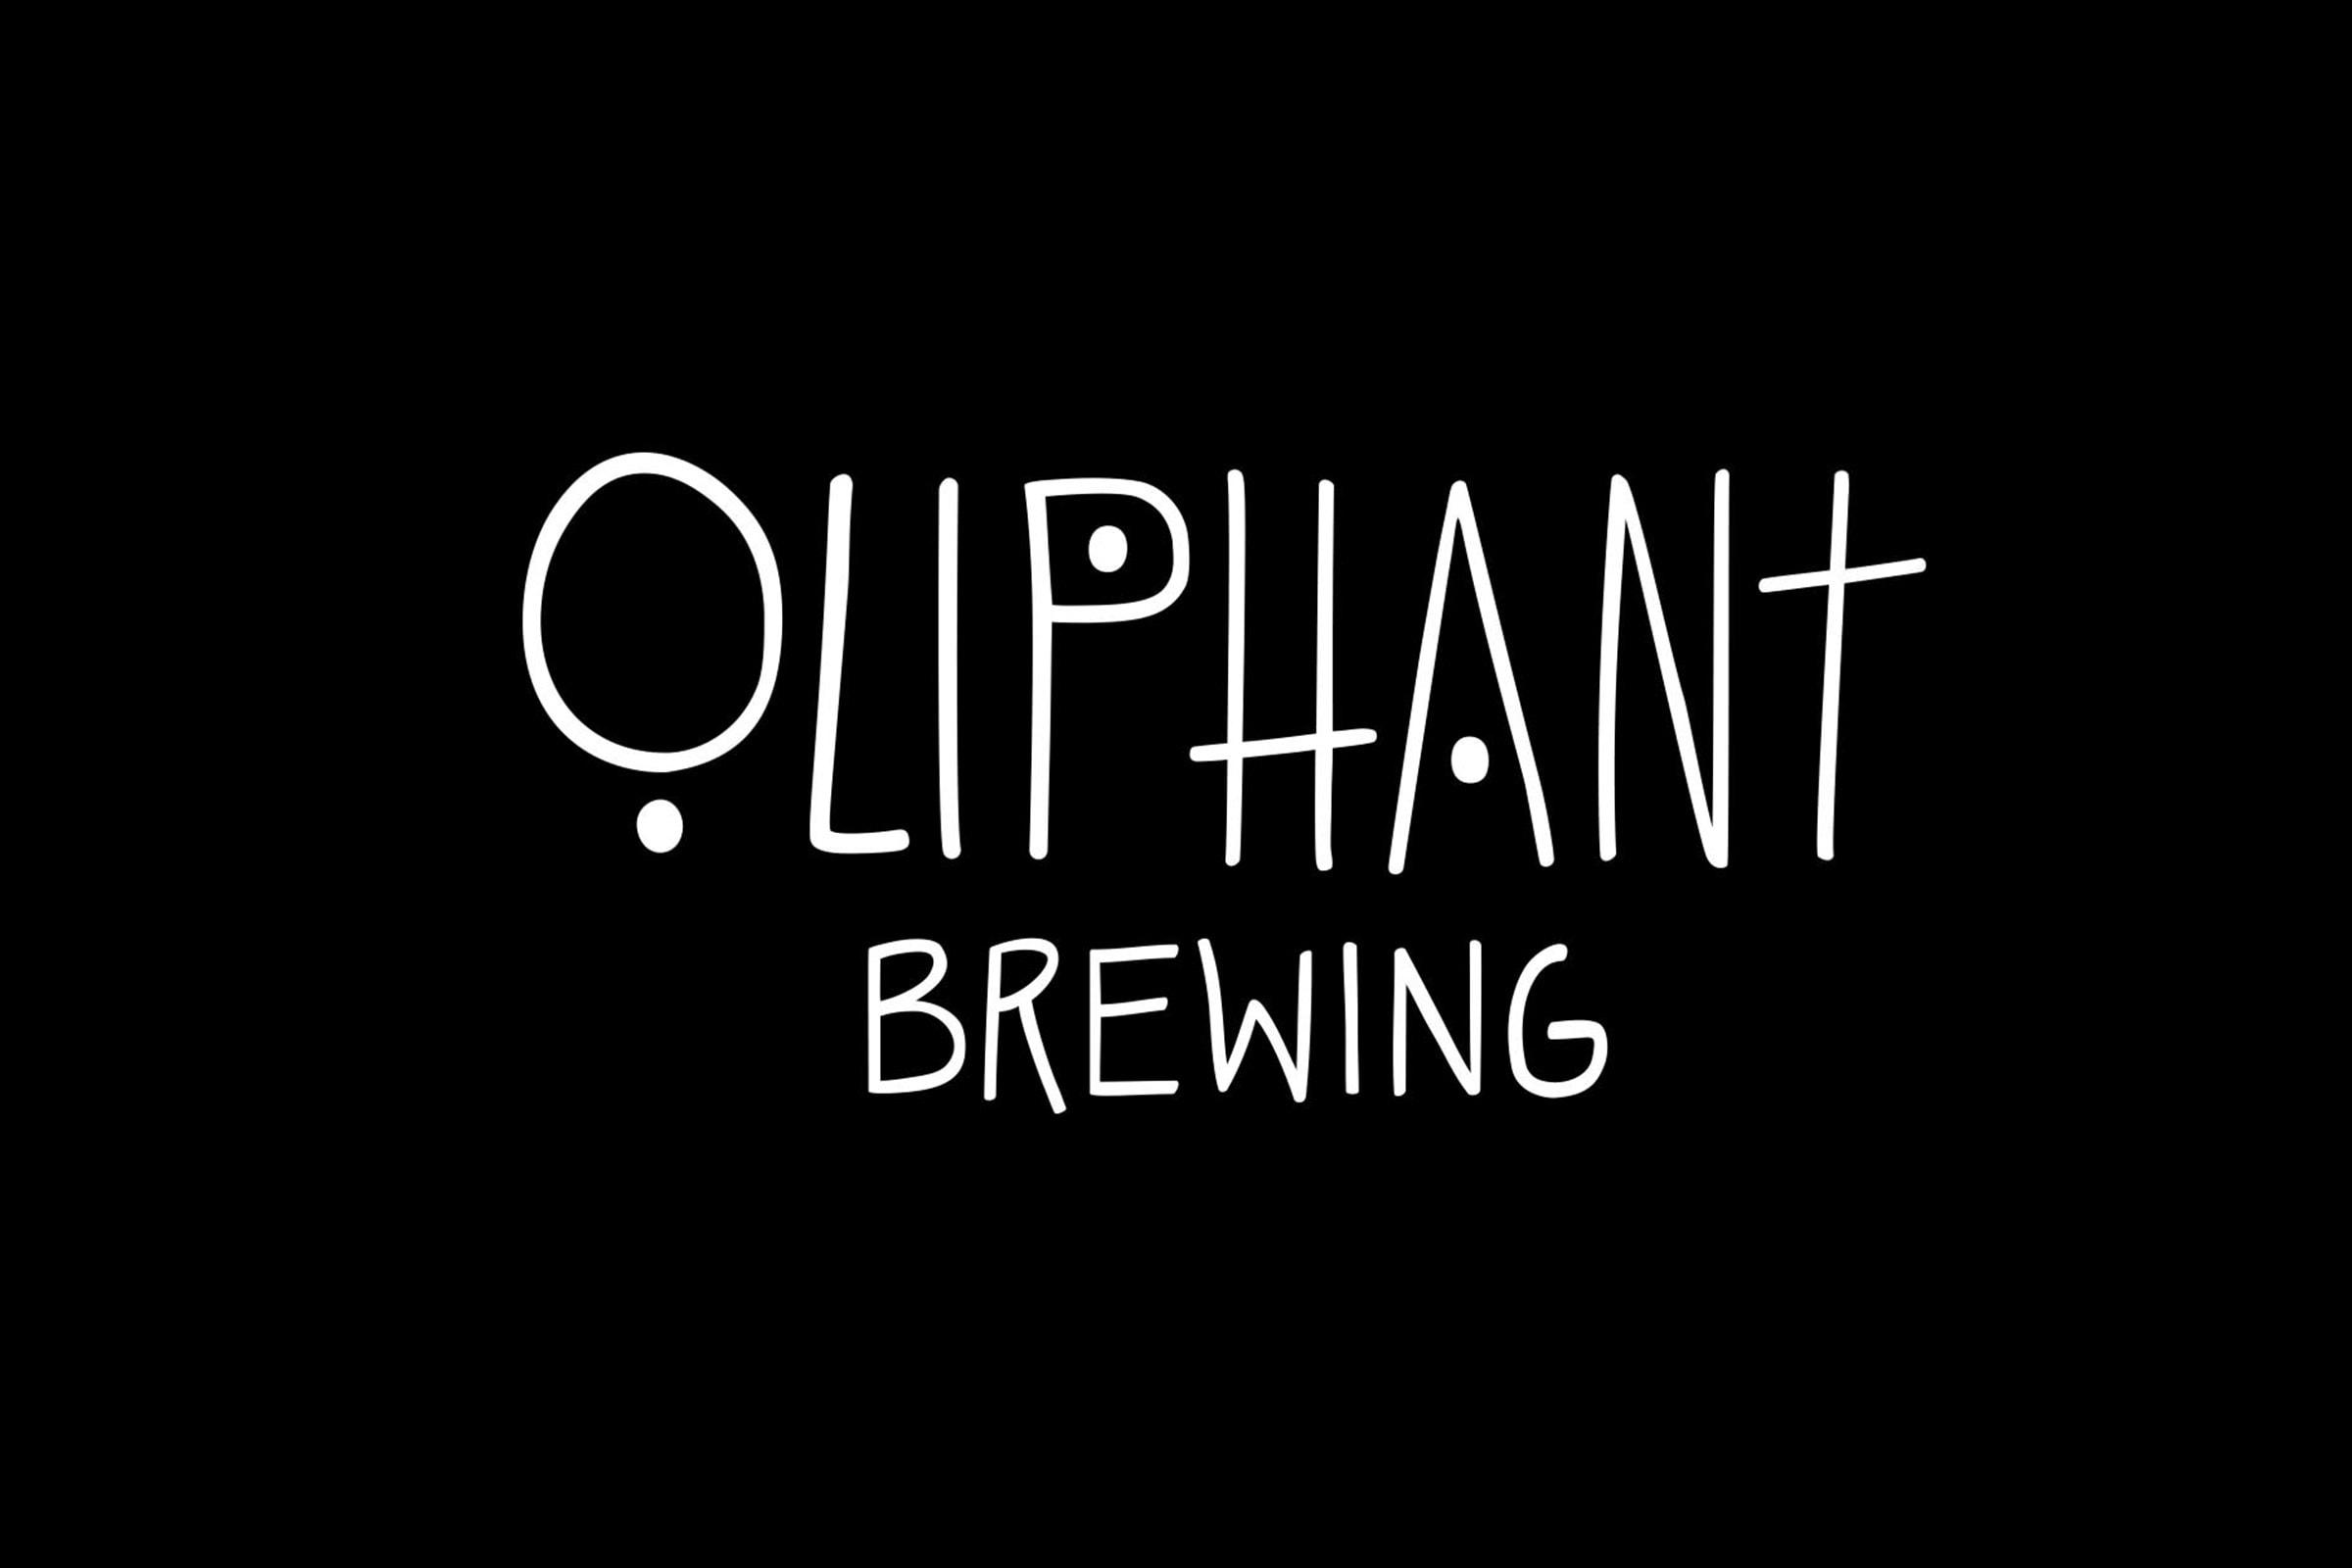 Packaging, Start Up, Artisanal Brewery, Craft Beer, New York Bier, typo logo